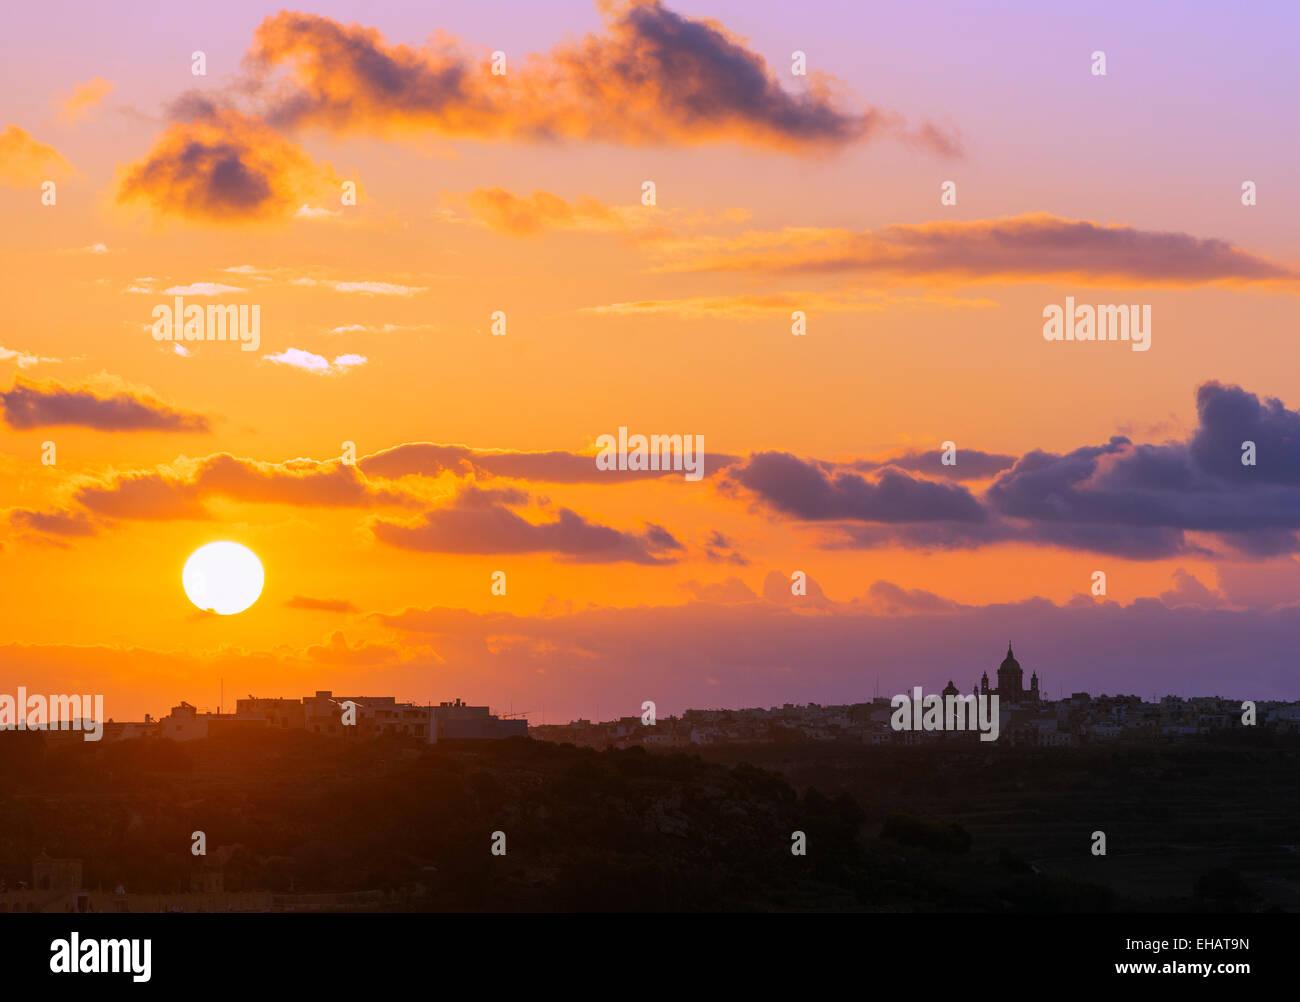 L' Europa mediterranea, Malta, Gozo Island, Xewkija Rotunda, sunrise Immagini Stock